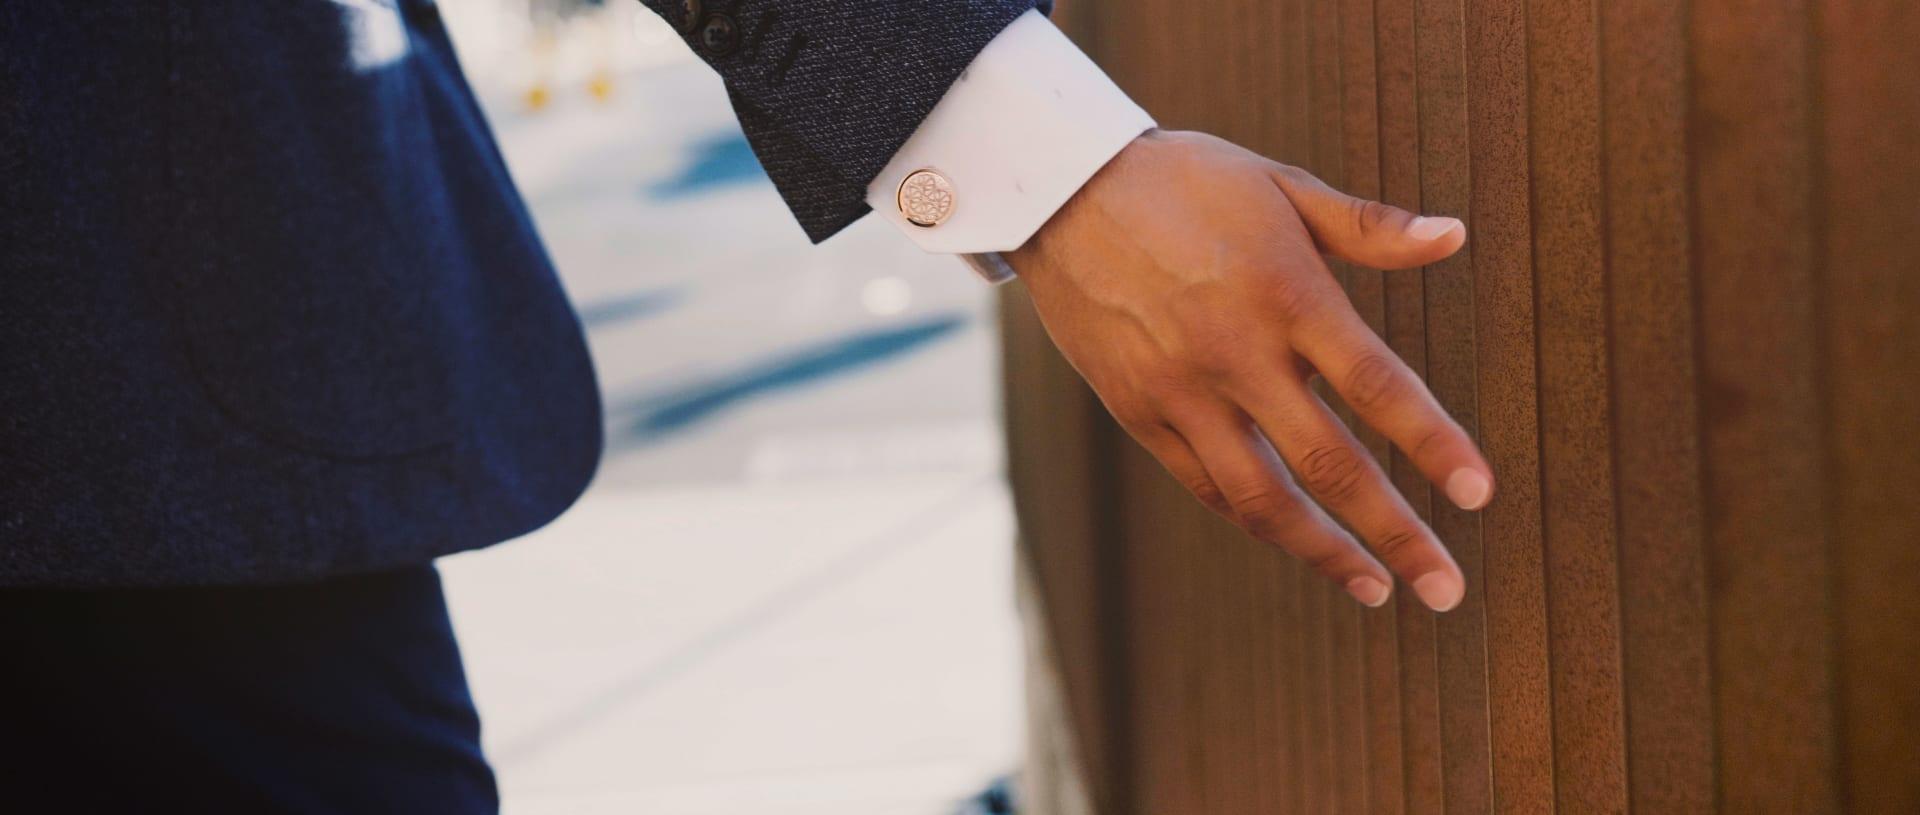 DAVIDOFF cufflinks & keyrings